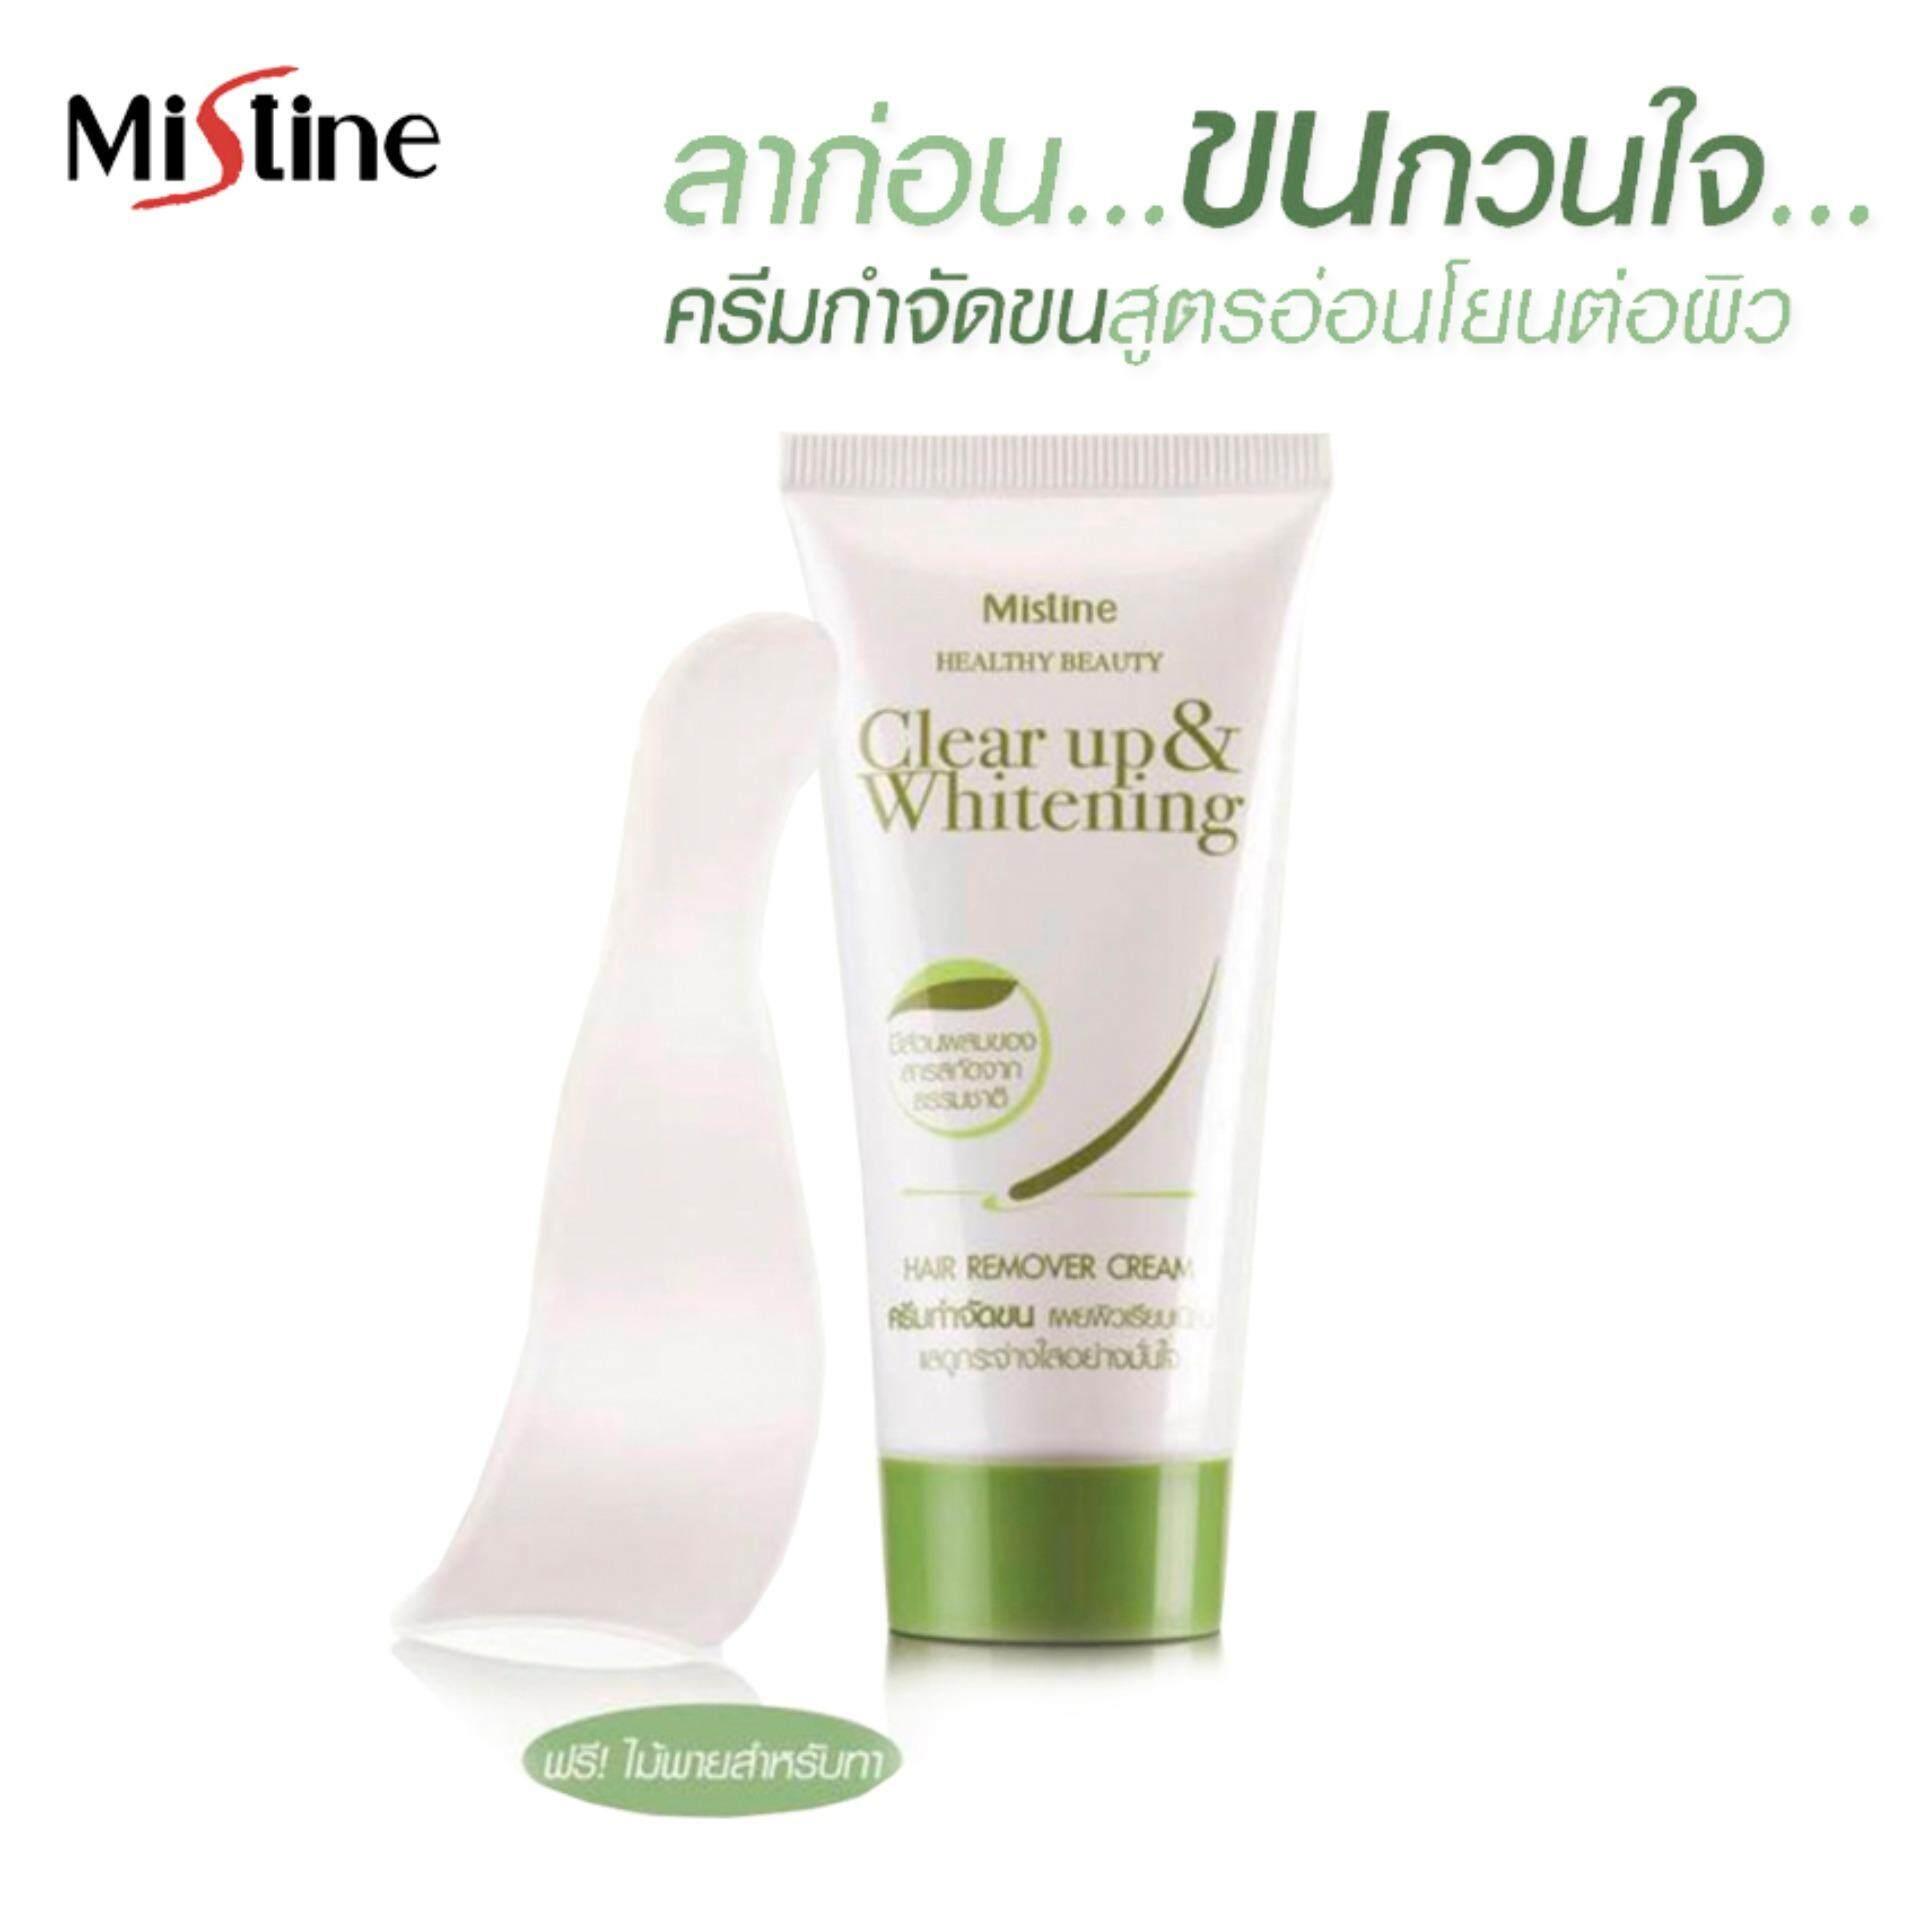 Mistine Healthy beauty Clear up & whitening Hair remover cream 50 g. มิสทิน เฮลตี้ บิวตี้ เคลียร์ อัพ แอนด์ ไวท์เทนนิ่ง แฮร์ รีมูฟเวอร์ ครีมกำจัดขน ผลิตภัณฑ์กำจักขน